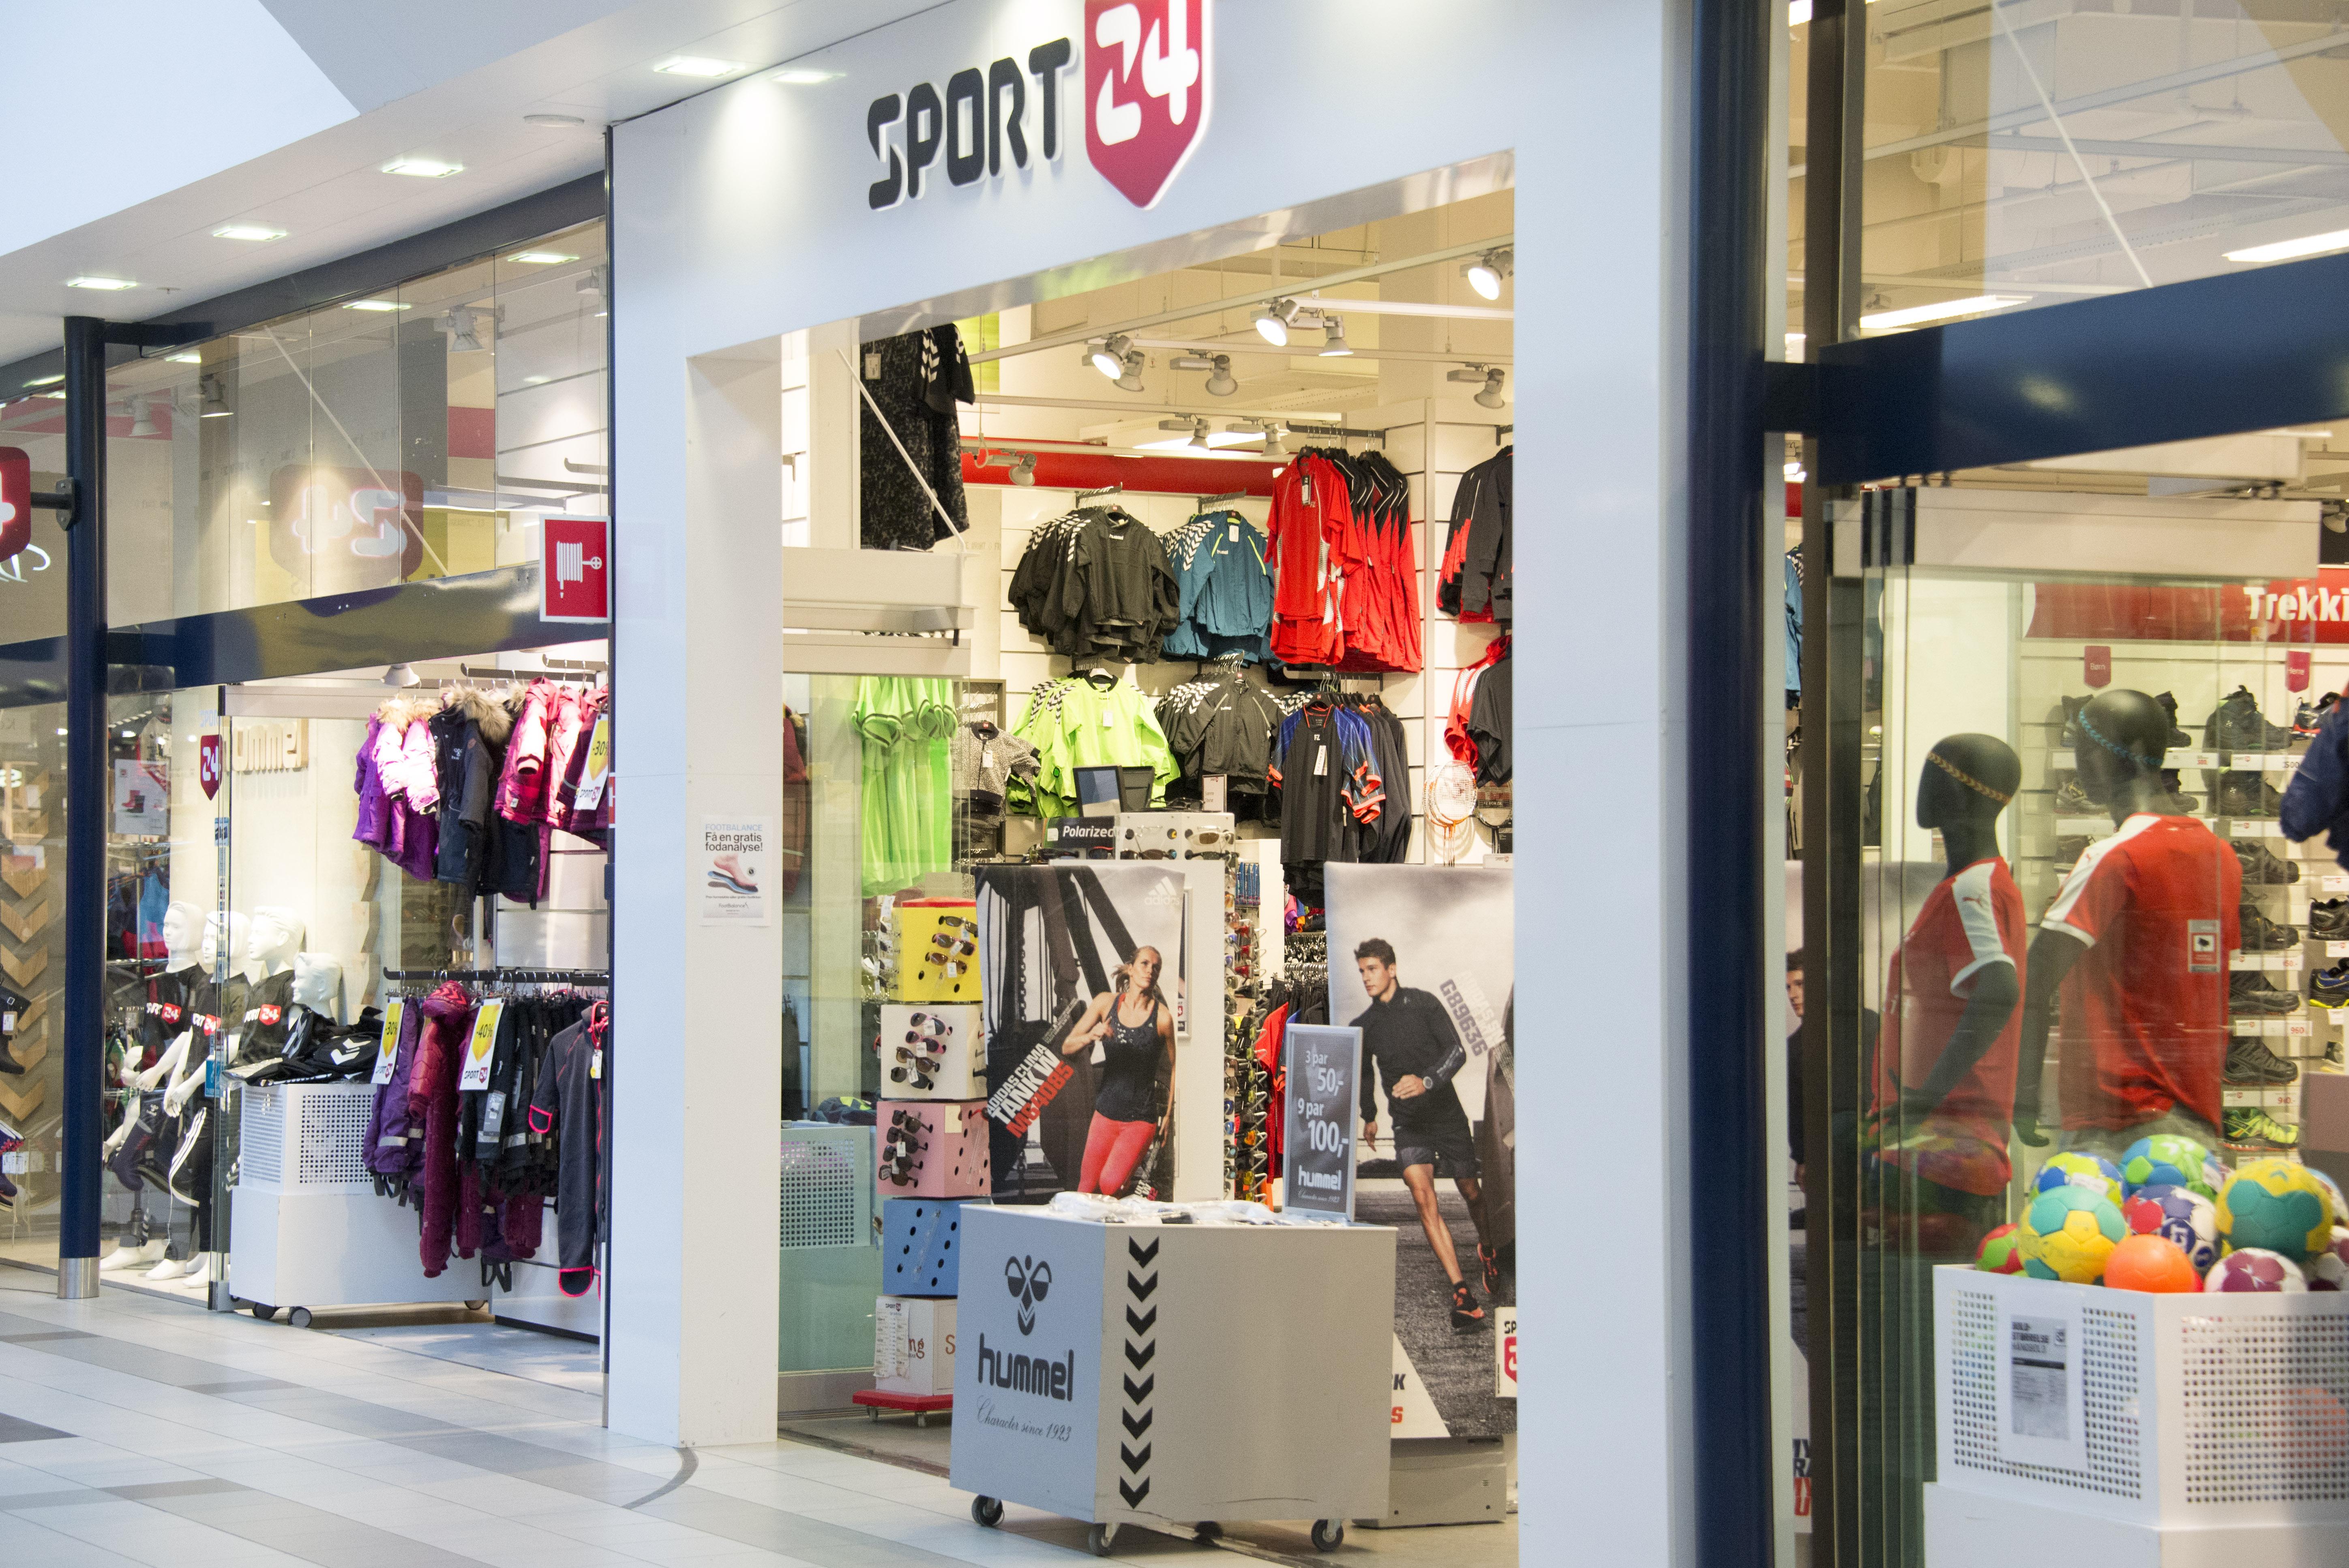 32e5ac46bab Otte nye butikker til Sport24 - RetailNews